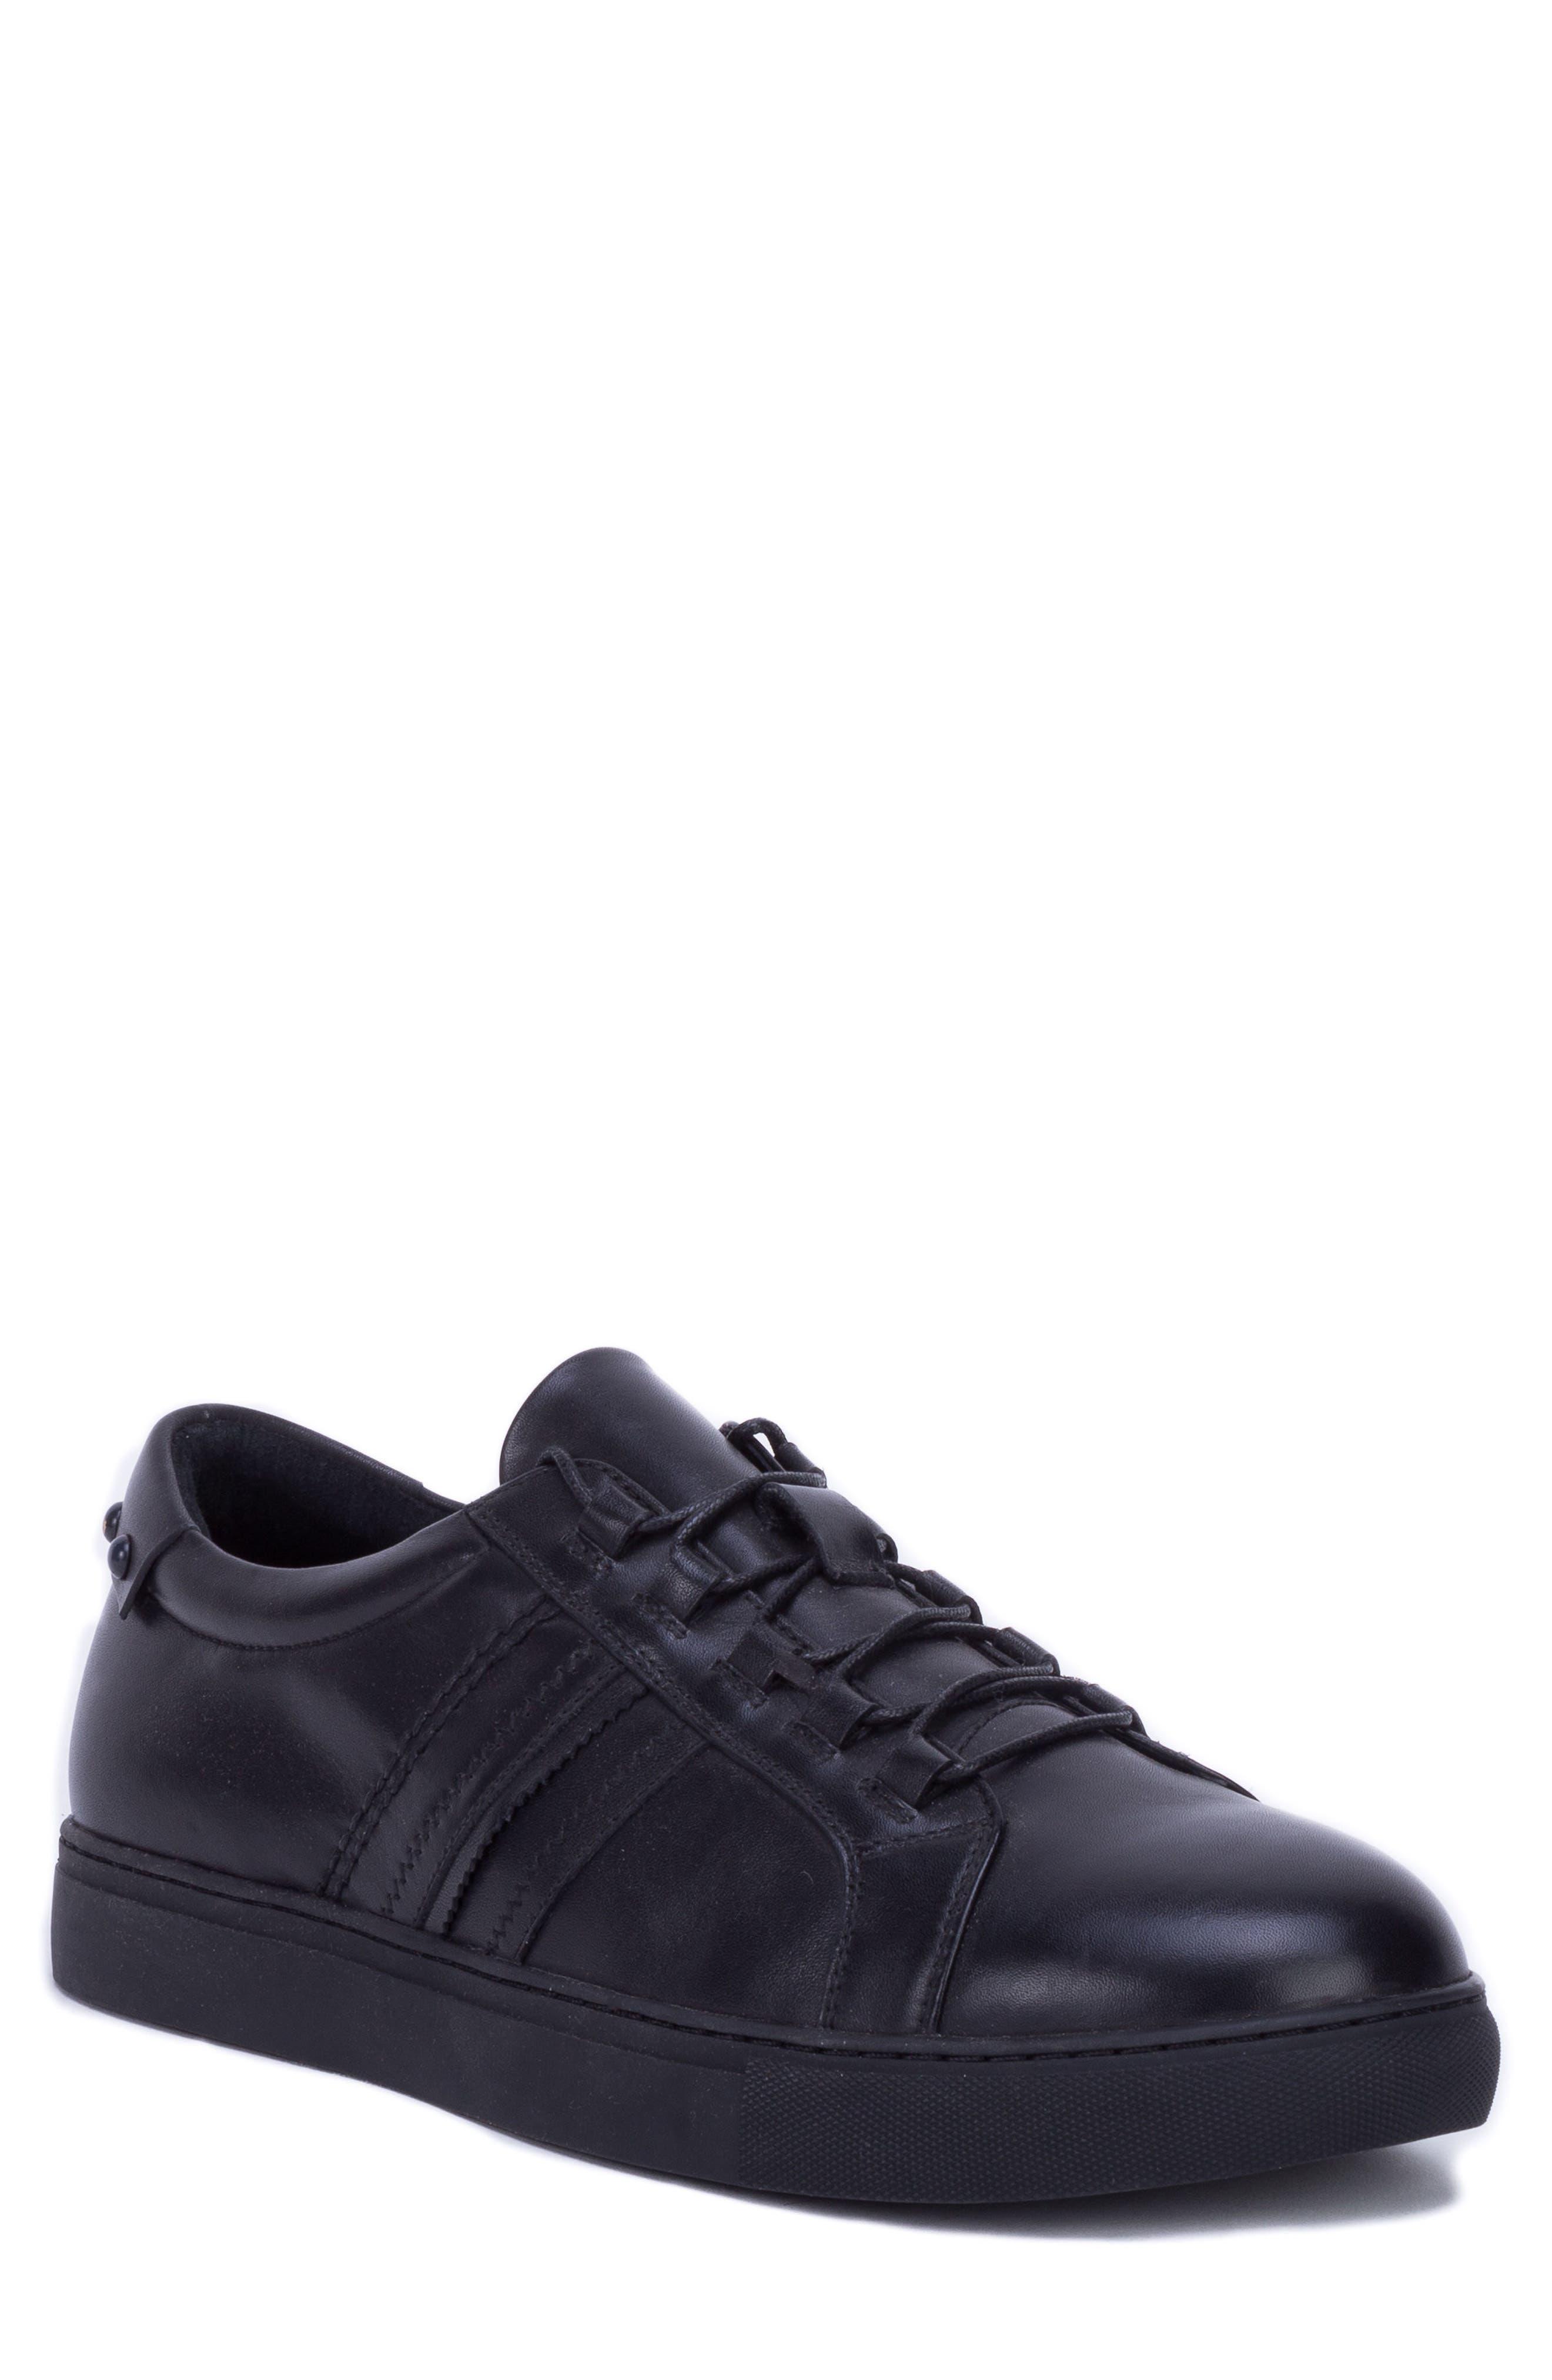 Robert Graham Horton Studded Low Top Sneaker, Black